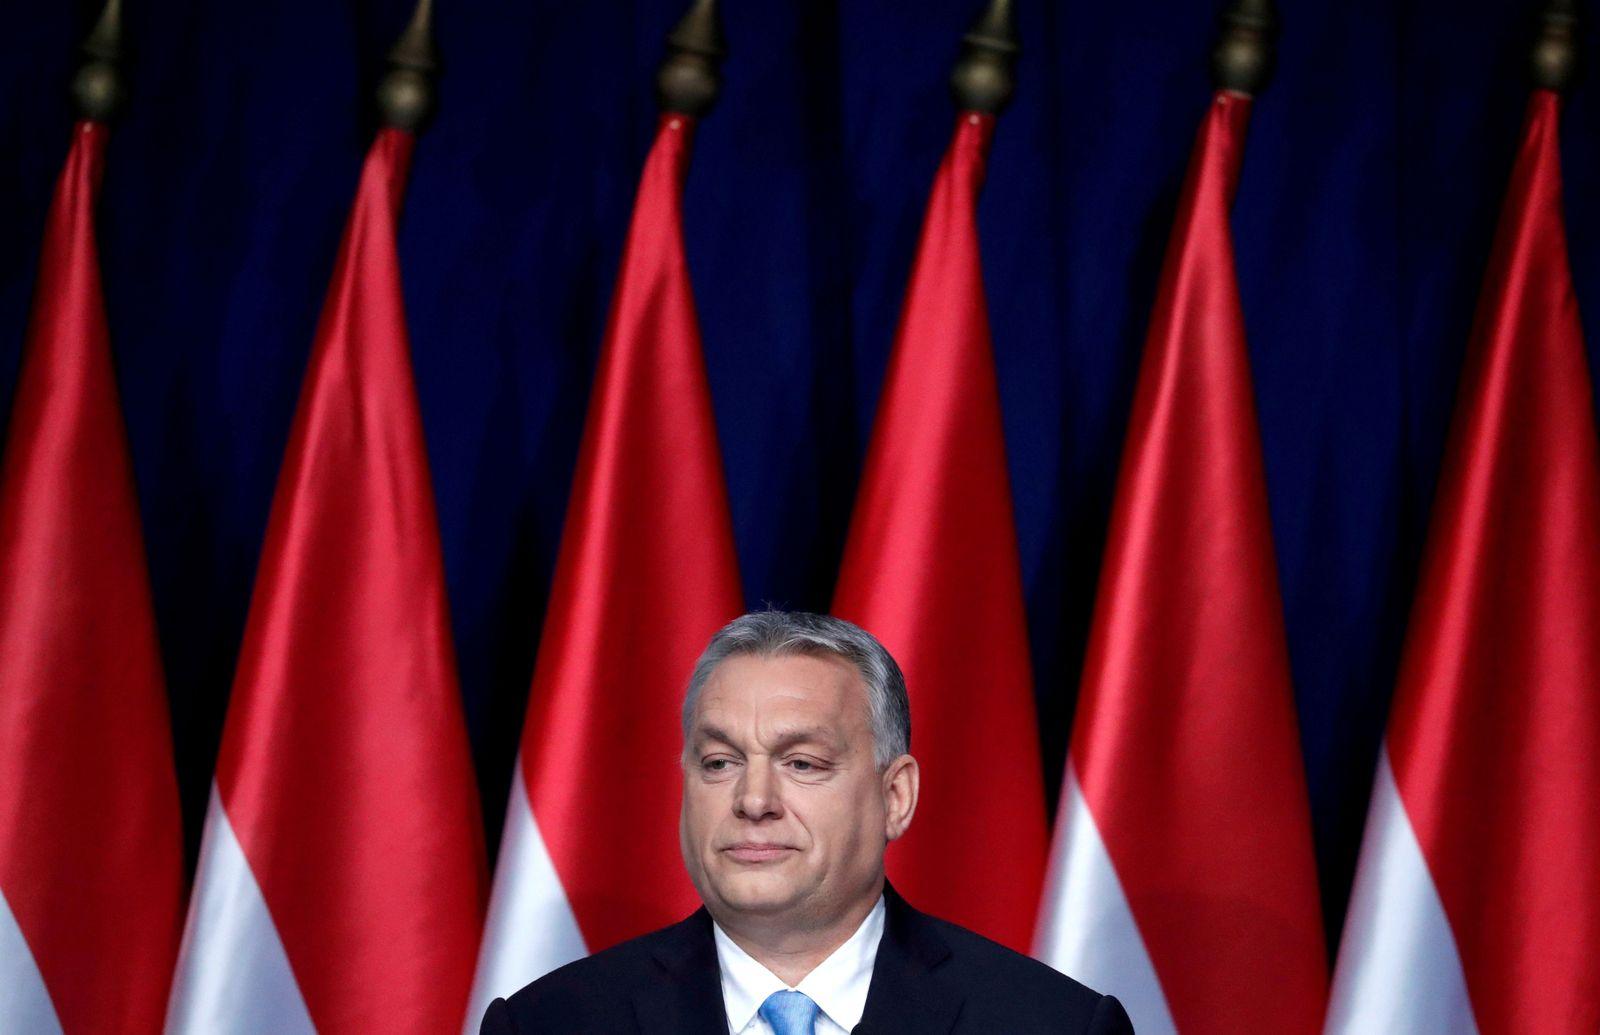 Ungarn Viktor Orbán